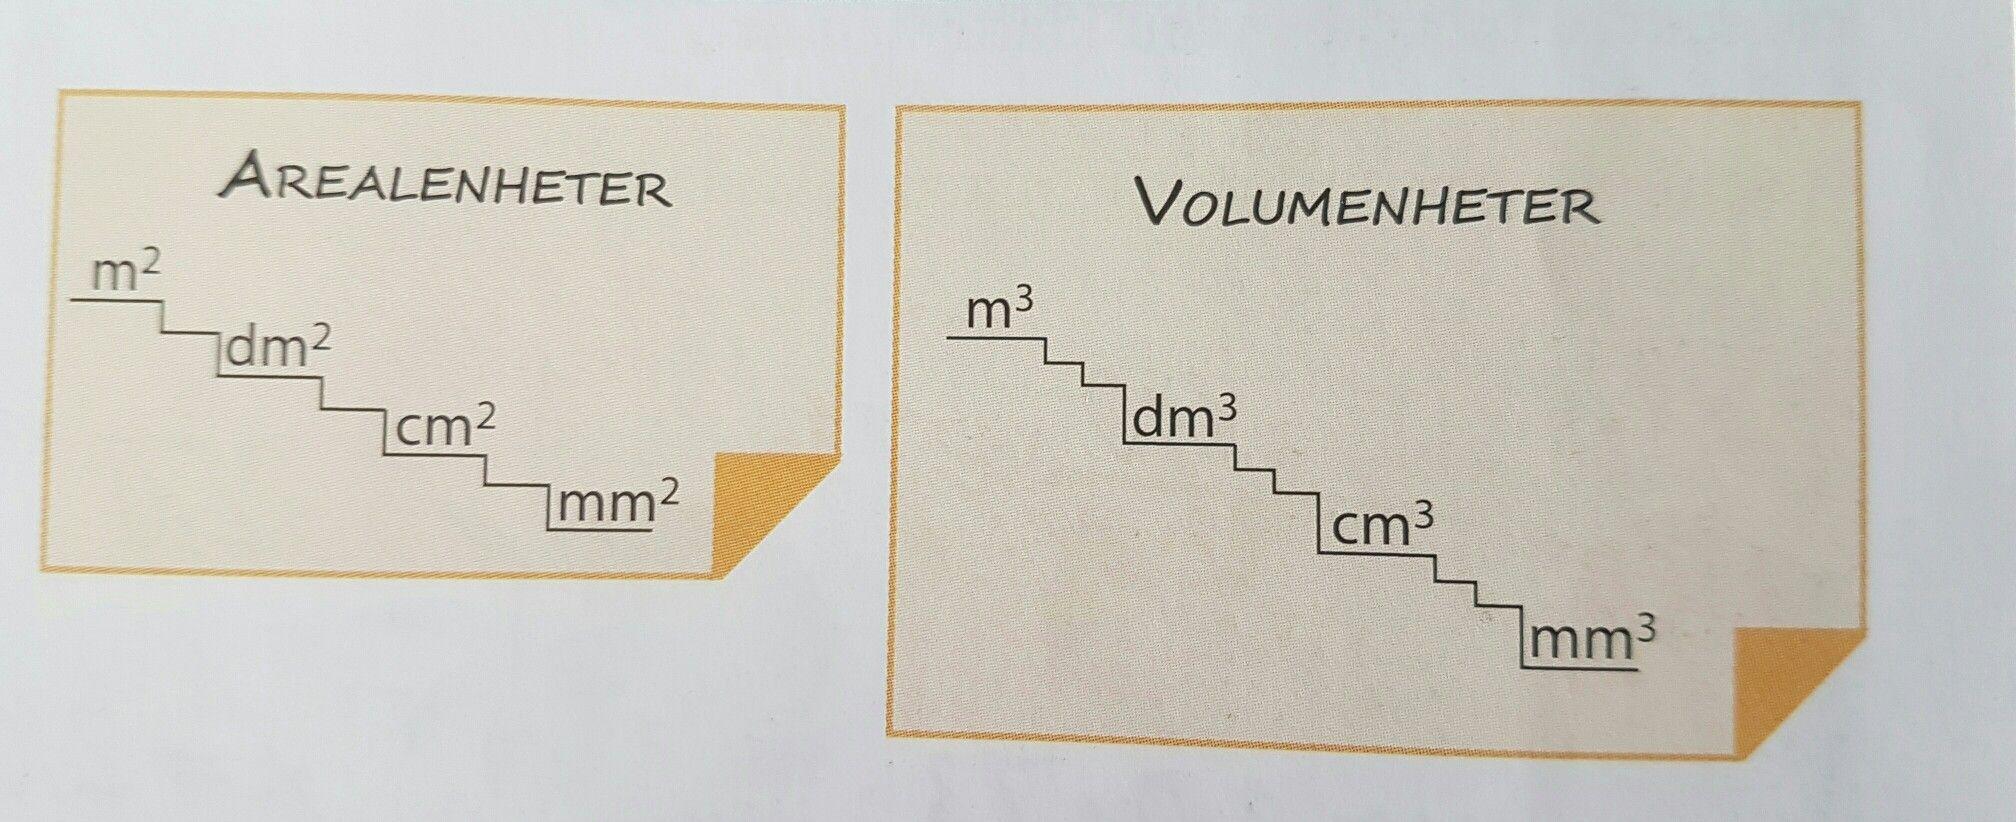 Smart area or volume converter